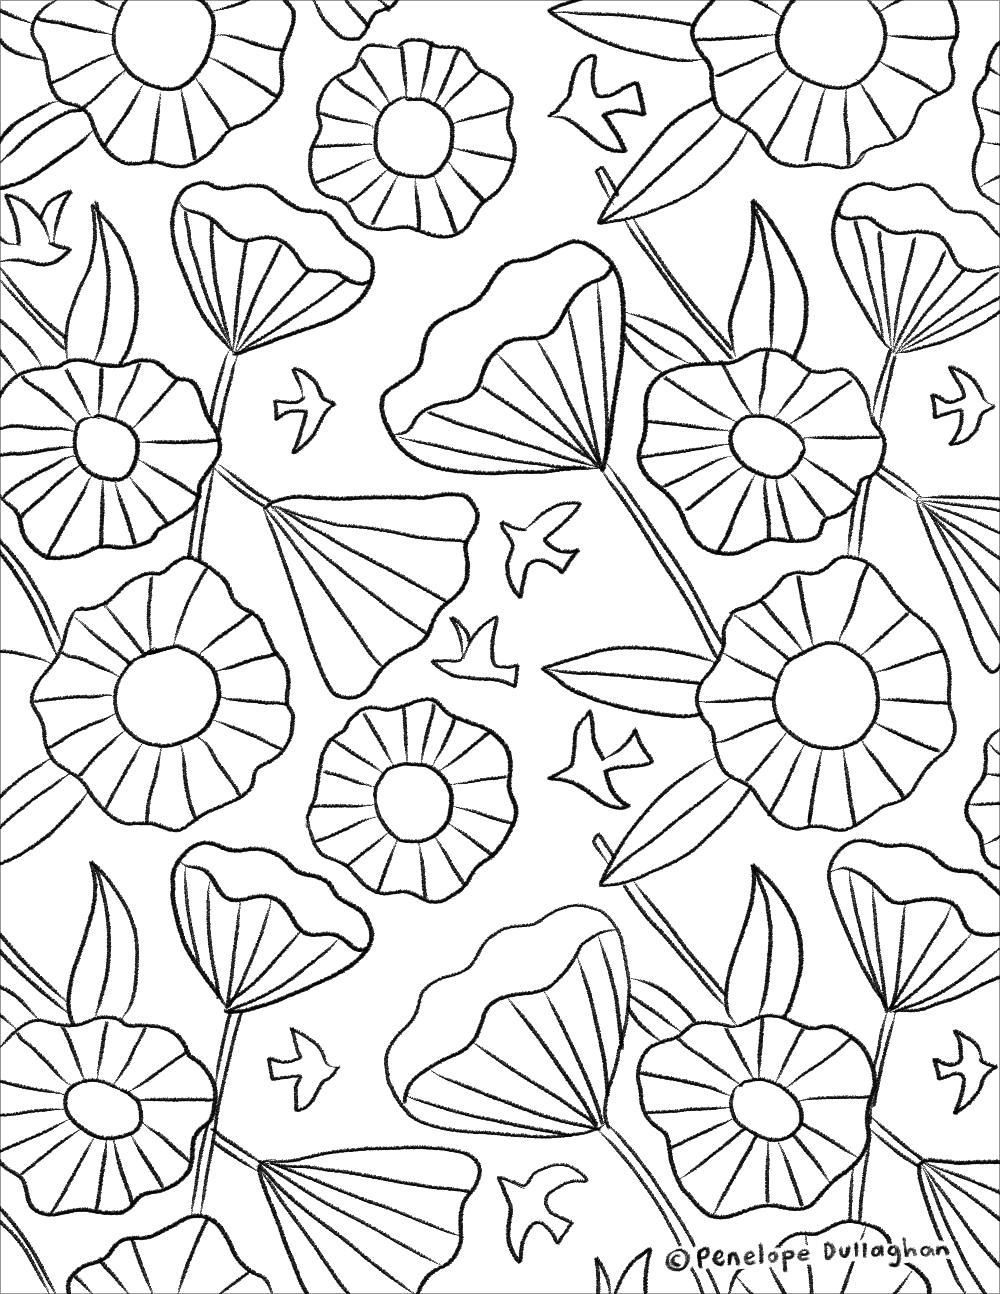 coloringpage_pattern_penelopedullaghan.jpg